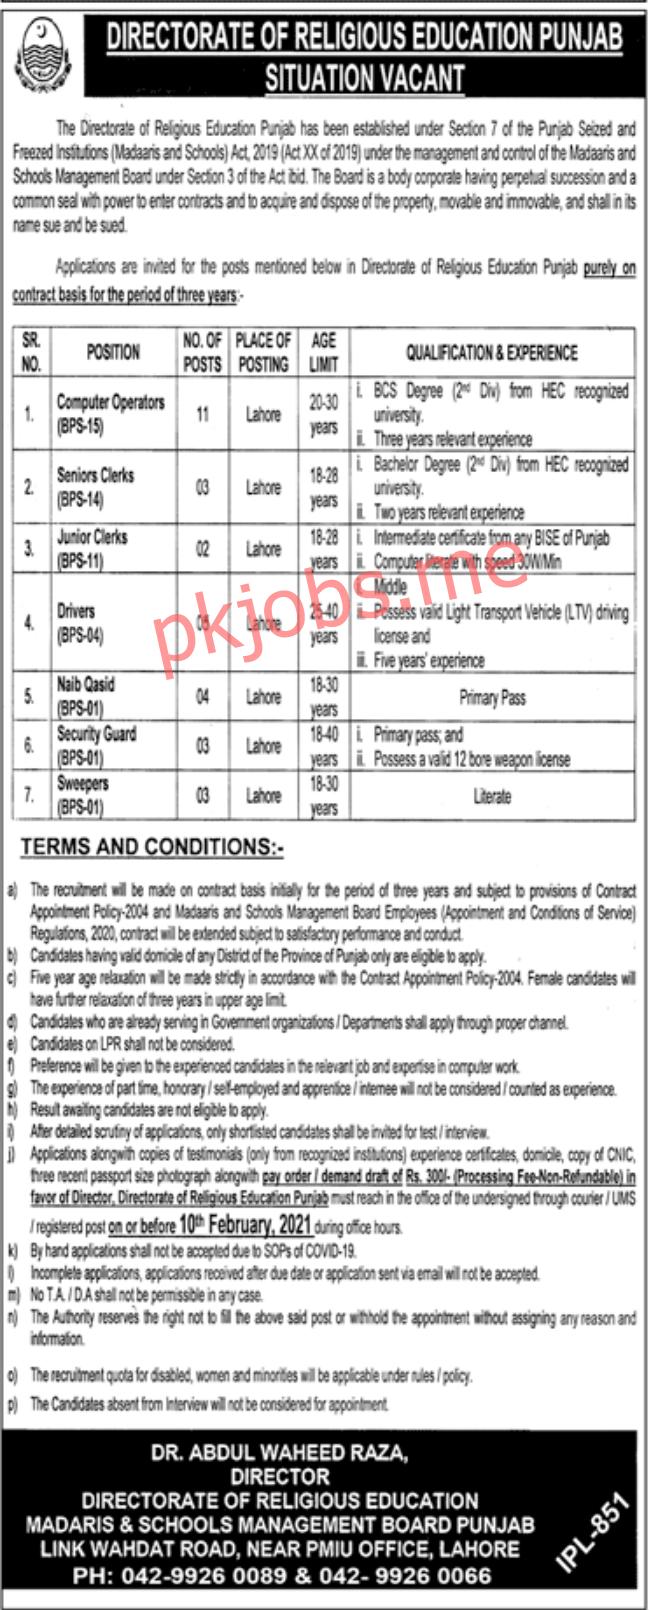 Latest Directorate of Religious Education Punjab Management Posts 2021